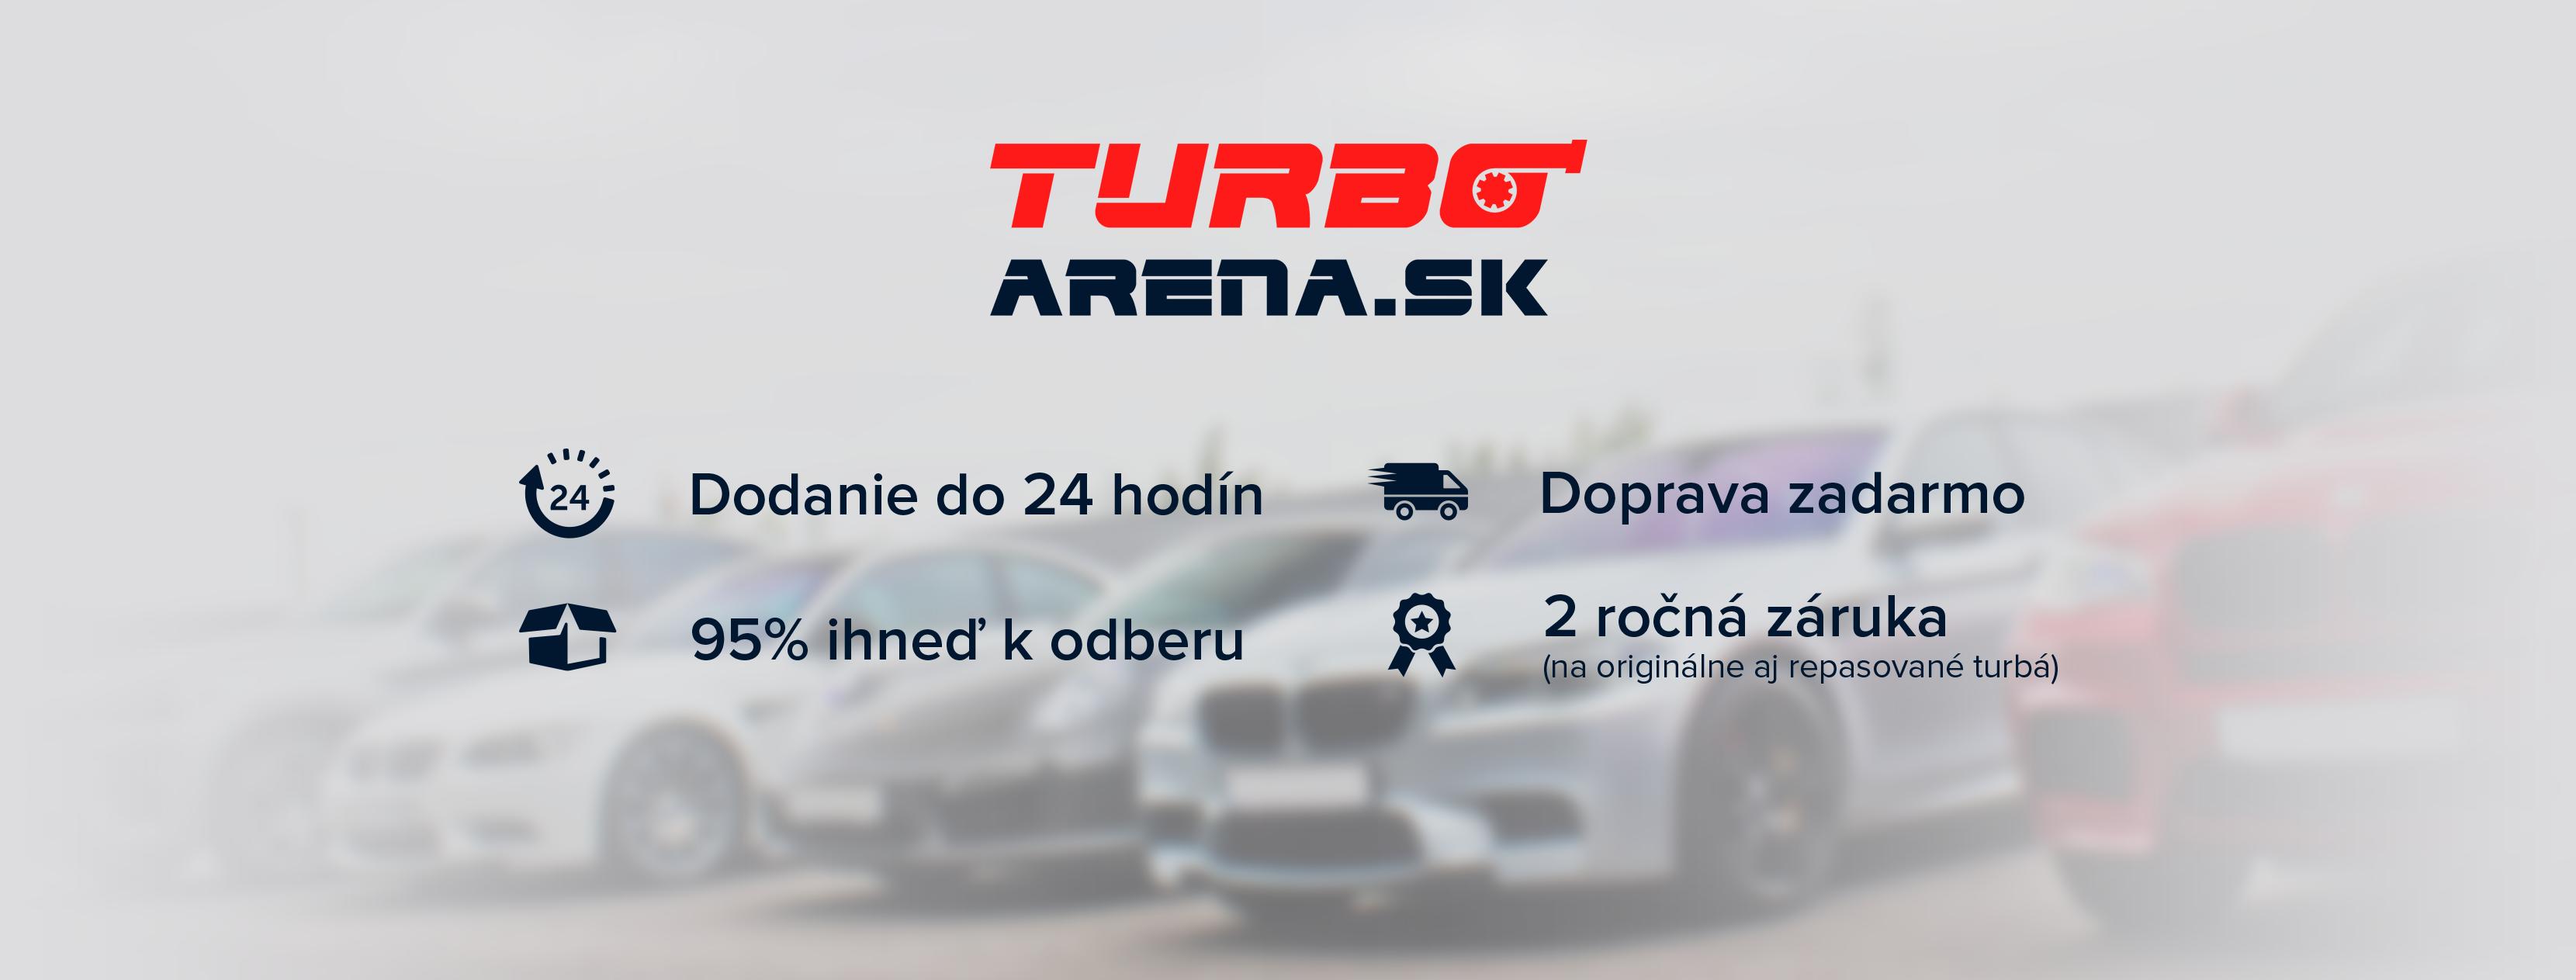 turbodúchadlá služby